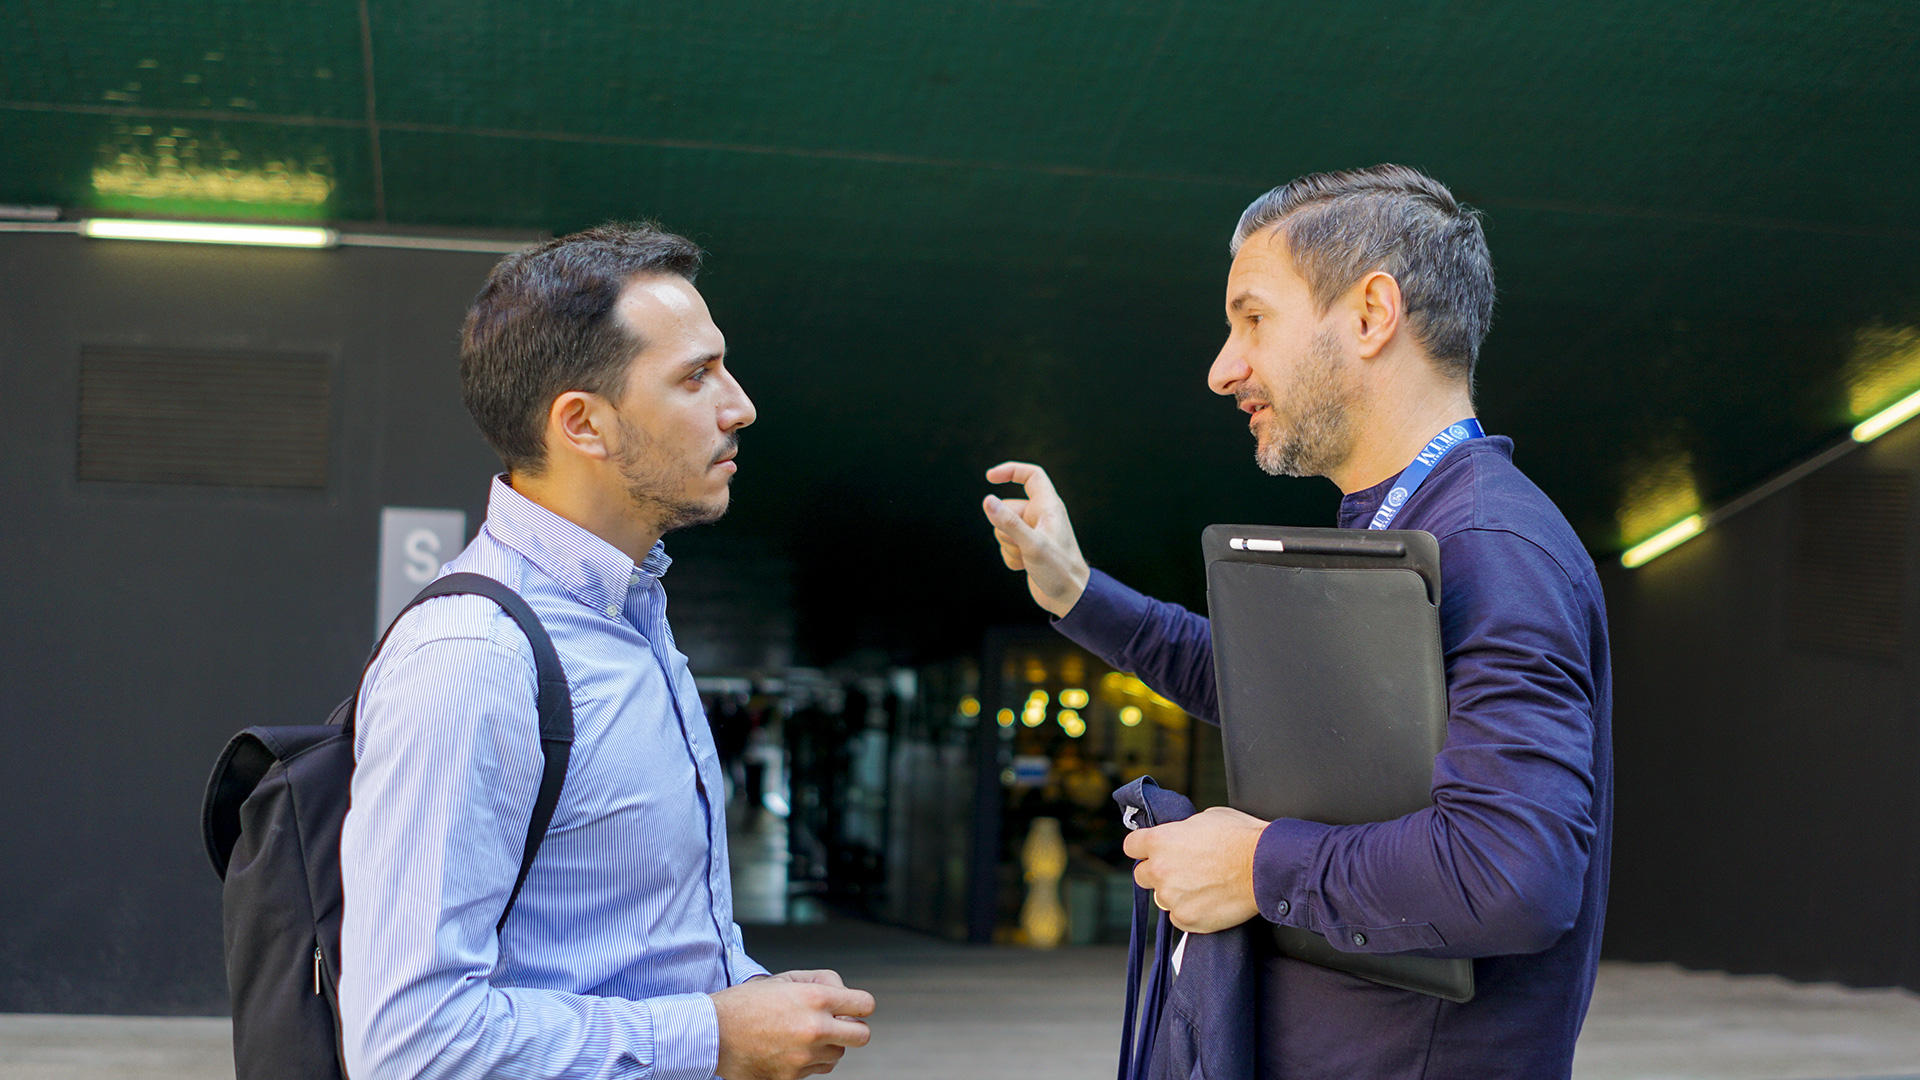 Claudio Mammana e Mirco Pasqualini @ Interbrand